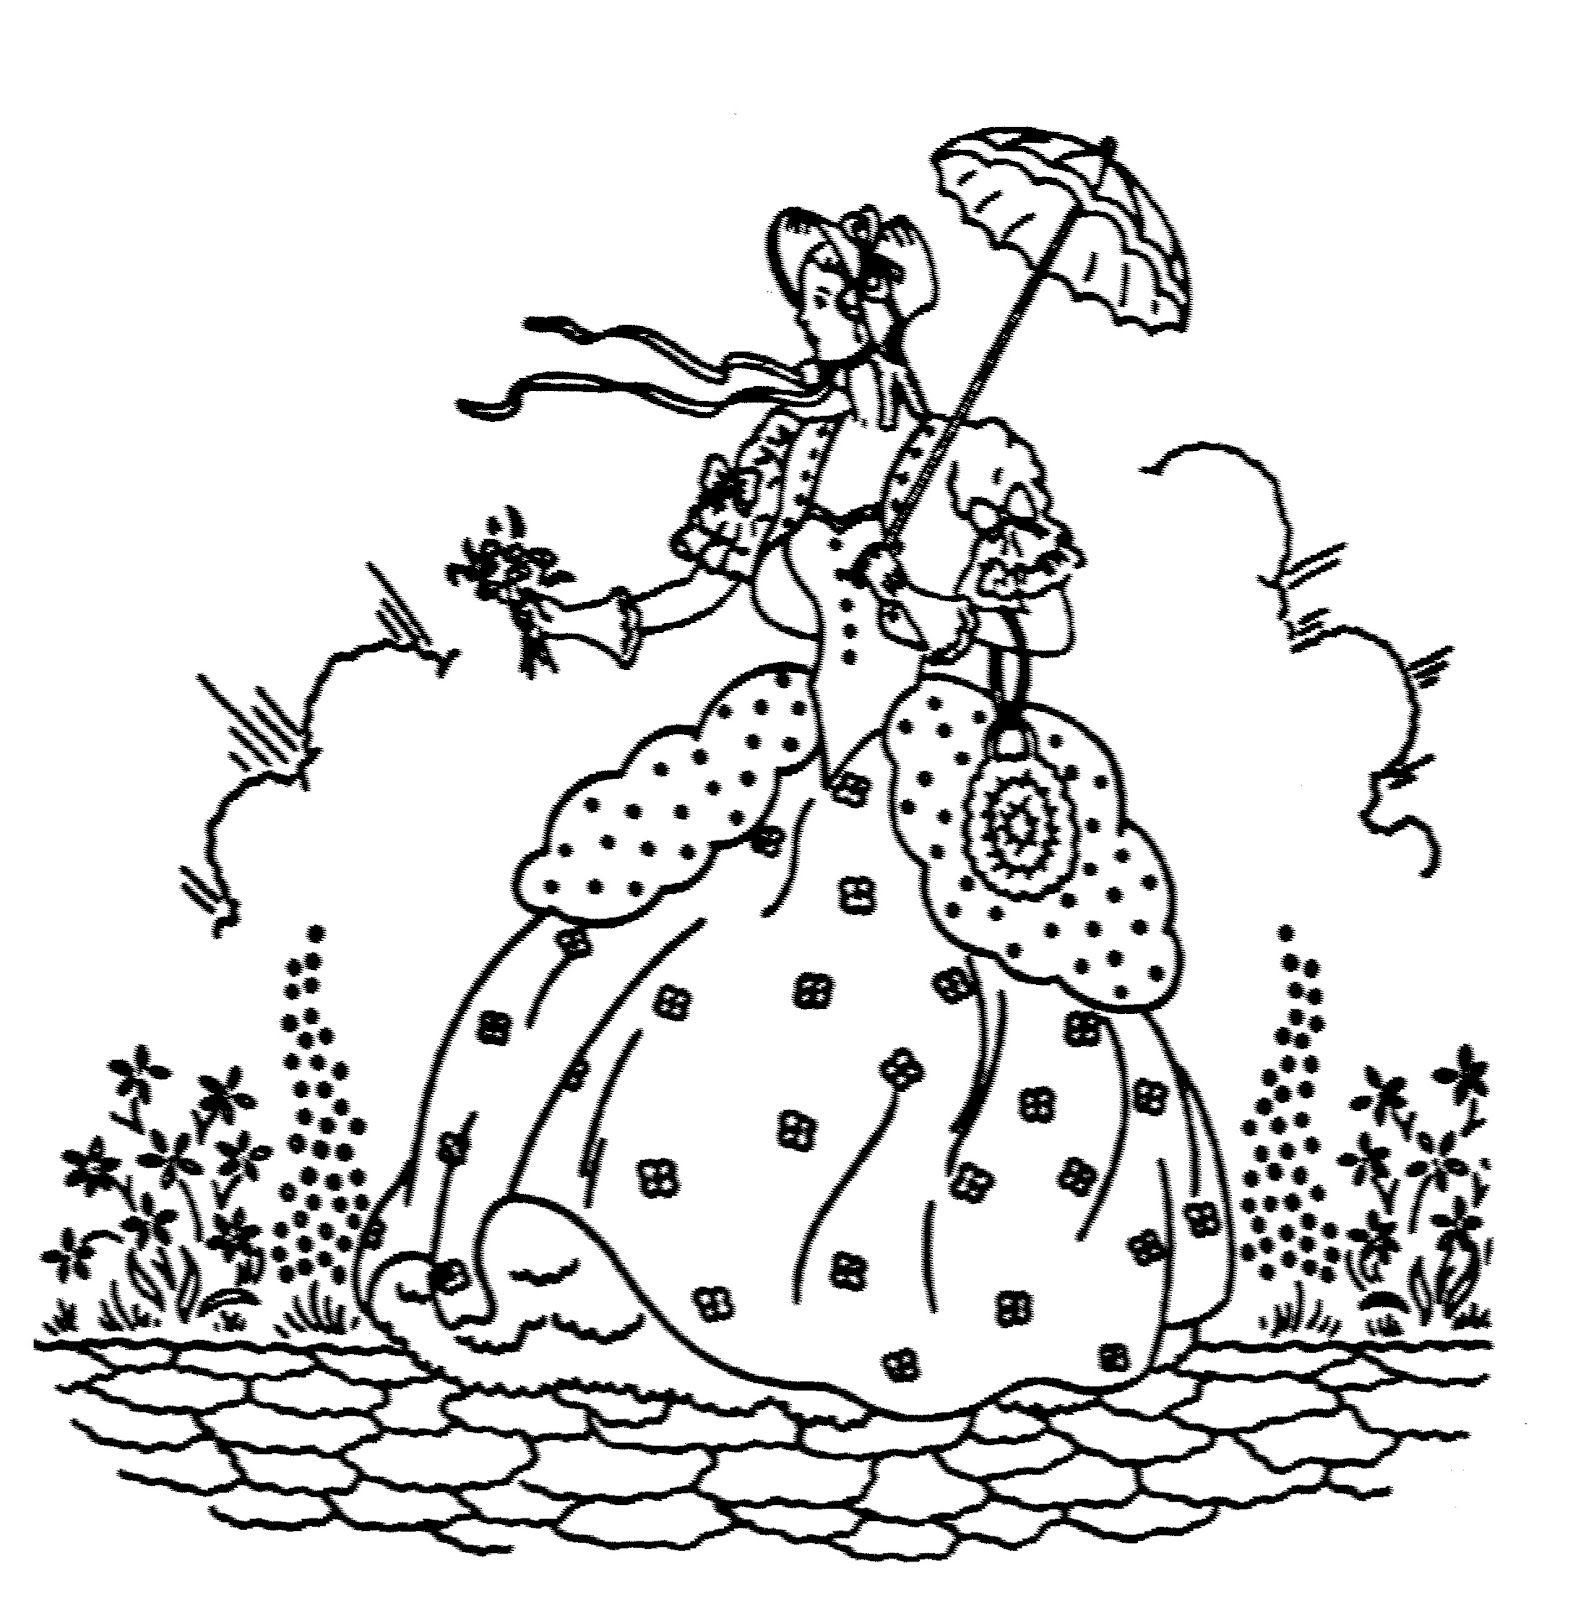 Southern Belle | Embroidery: Crinoline Ladies | Pinterest | Bordado ...